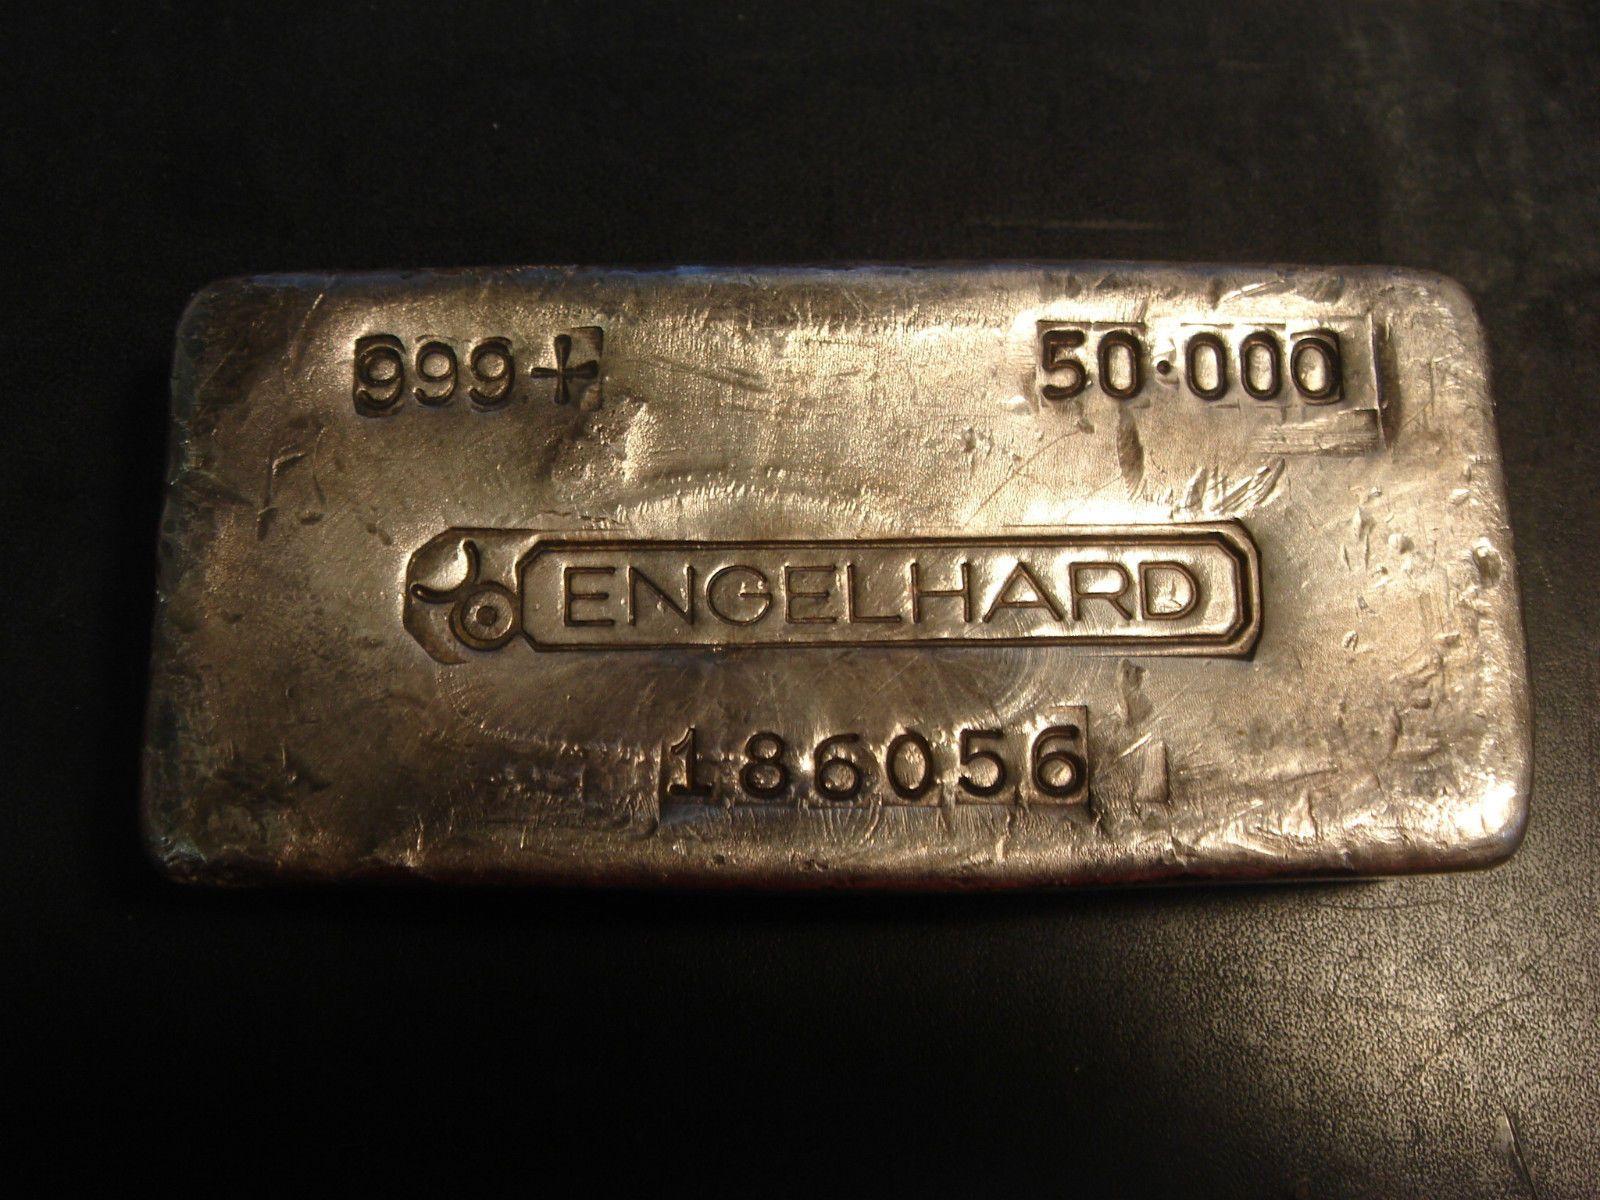 Engelhard Bullhorns Old Poured Loaf 50 Oz 999 Silver Bar Vintage Collectible Silver Bullion Silver Bars Silver Gold